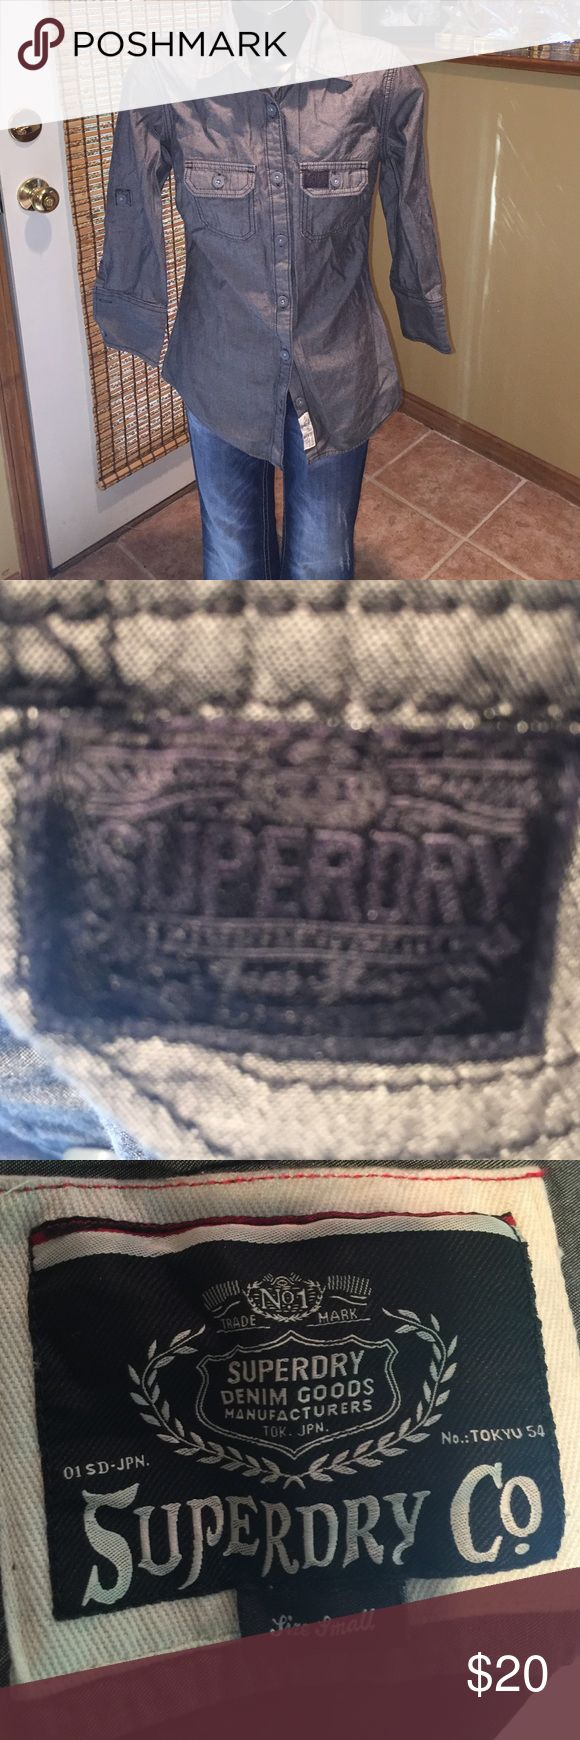 Superdry Grey Longsleeve Shirt Slate Grey Size Small Superdry Shirt Superdry Tops Button Down Shirts